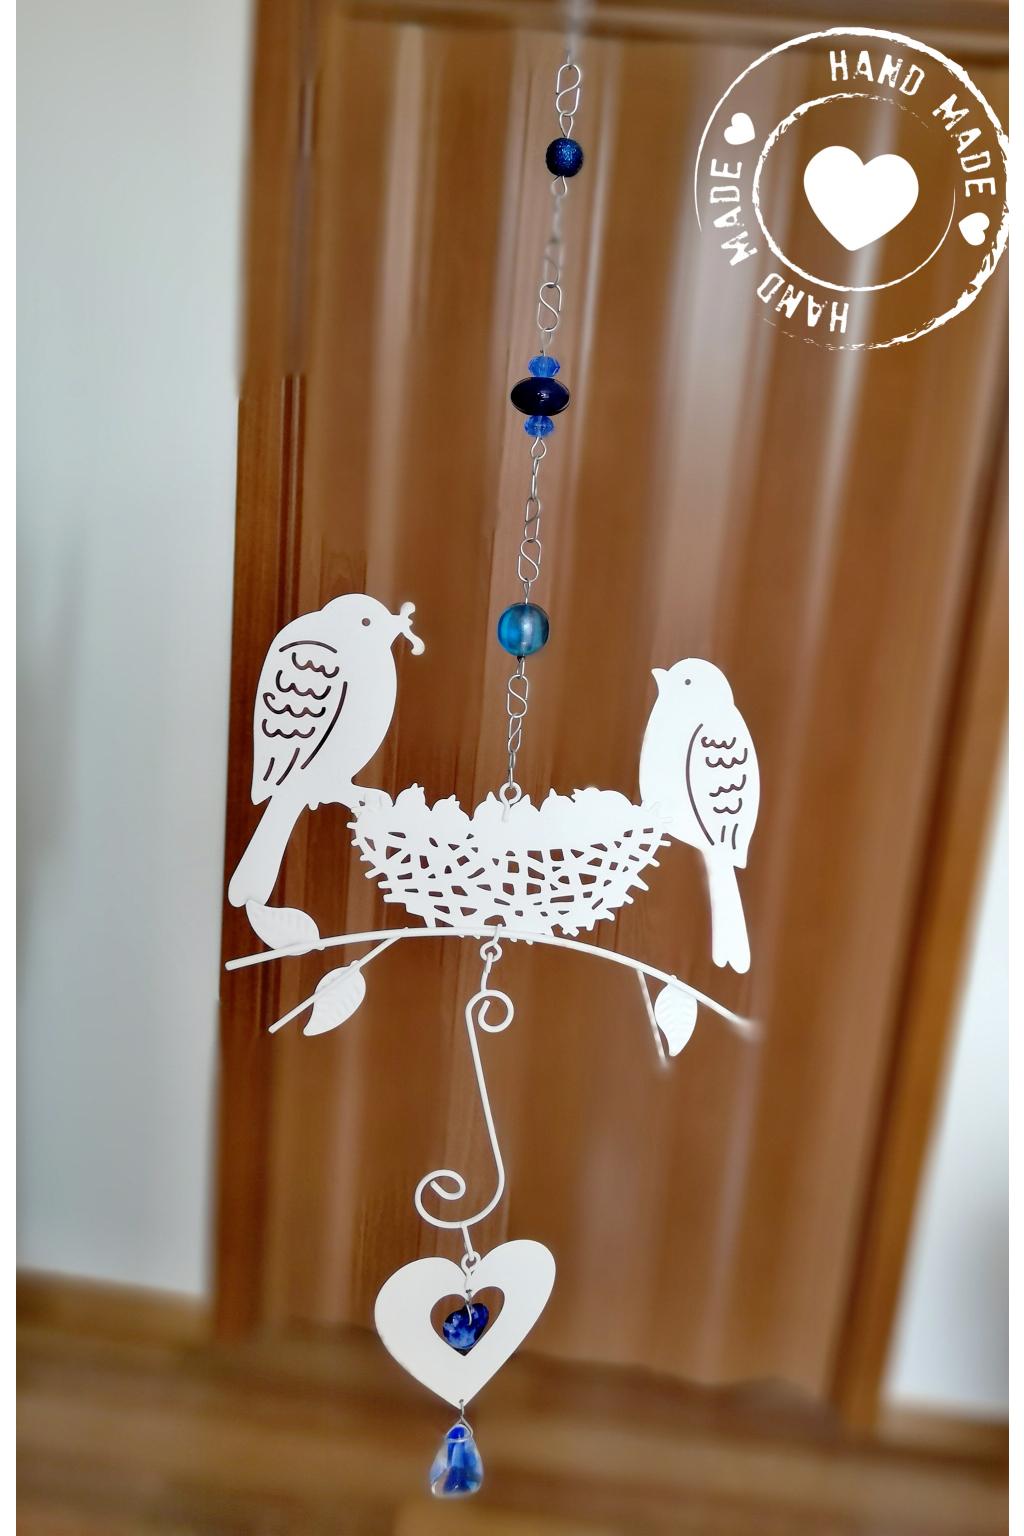 Závěs s ptáčky a srdcem Swarovski - modrý 55cm